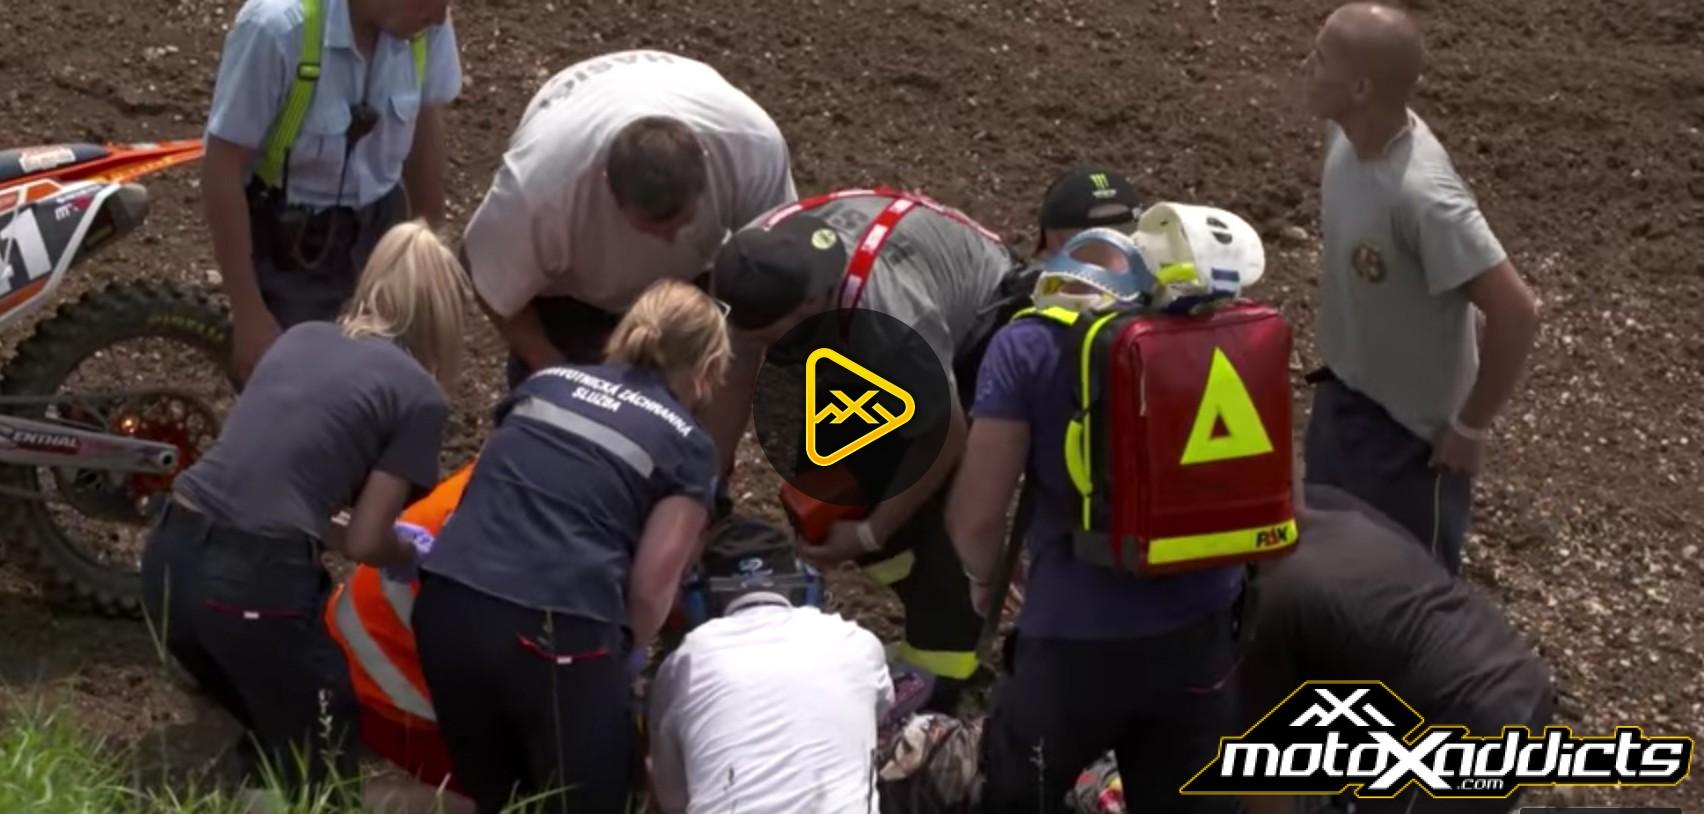 Pauls Jonass' Gnarly Crash – 2016 MXGP of Czech Republic